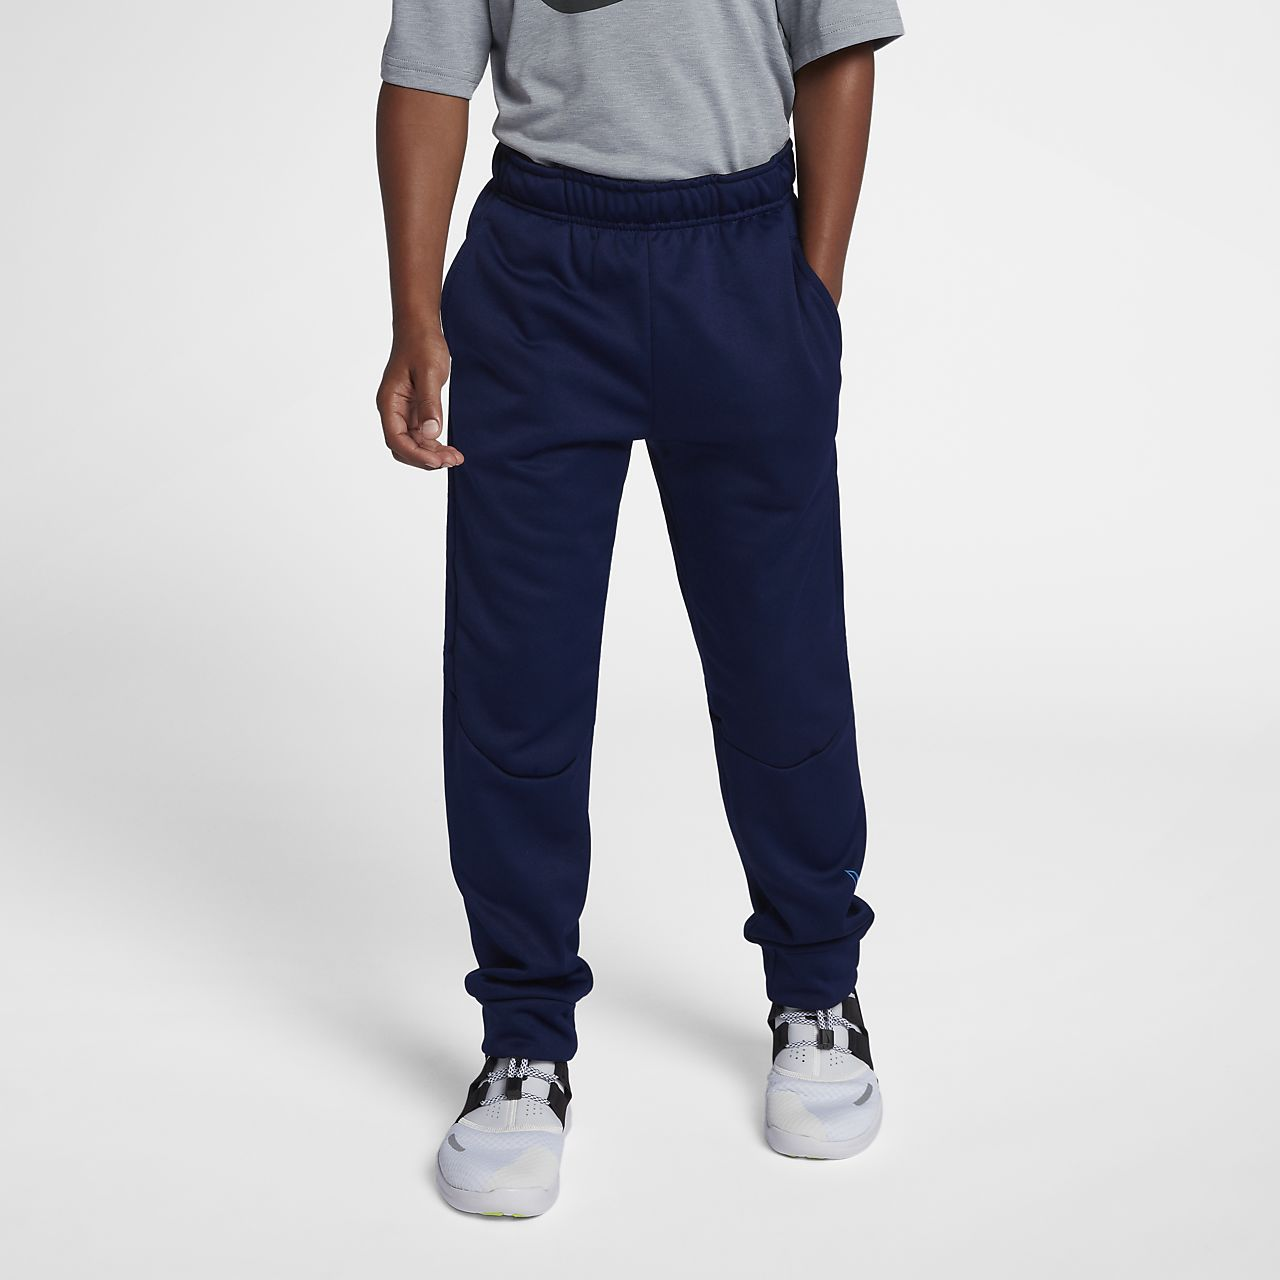 Pour Pantalon Garçon Plus De Training Dri Fit Nike Âgé Therma xrxgw